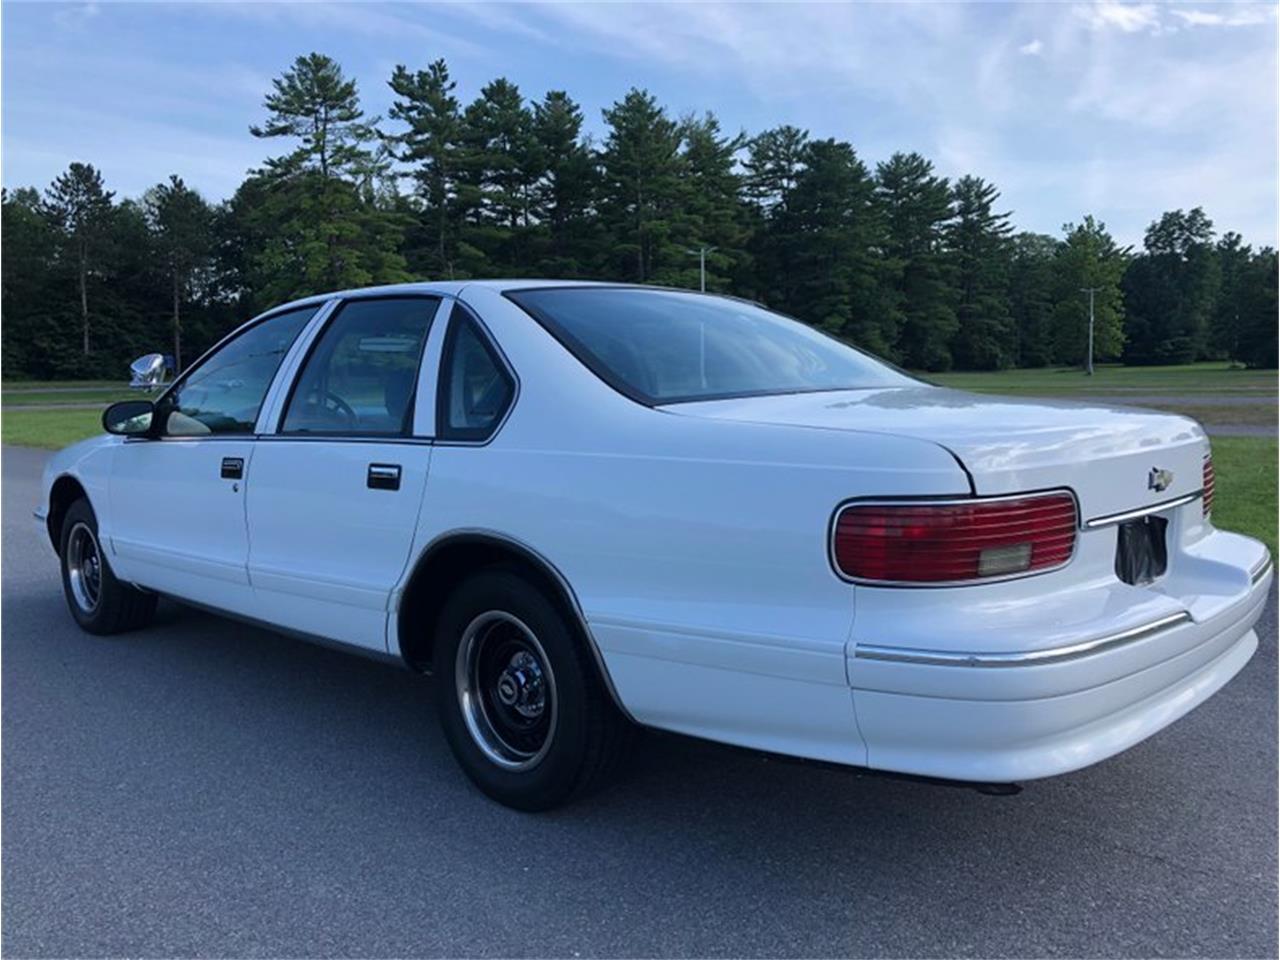 1995 Chevrolet Caprice (CC-1249474) for sale in Saratoga Springs, New York